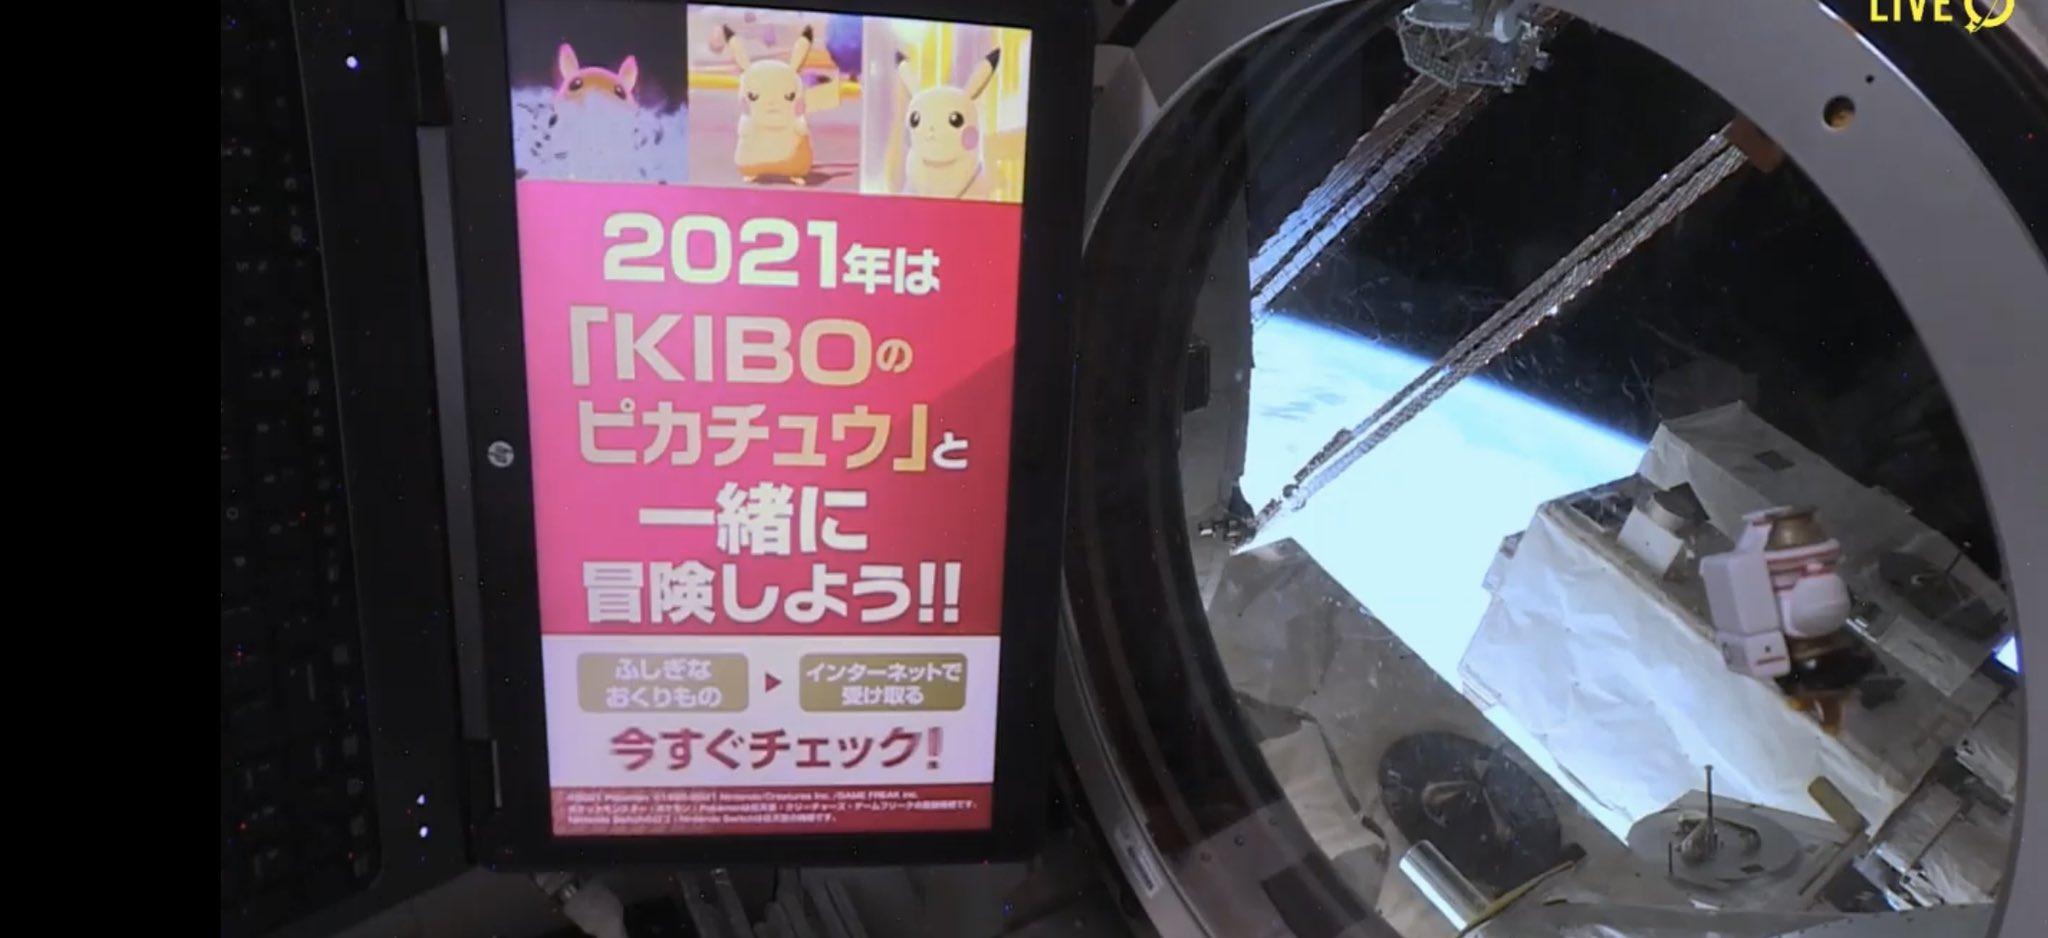 Kibo Pokemon ISS